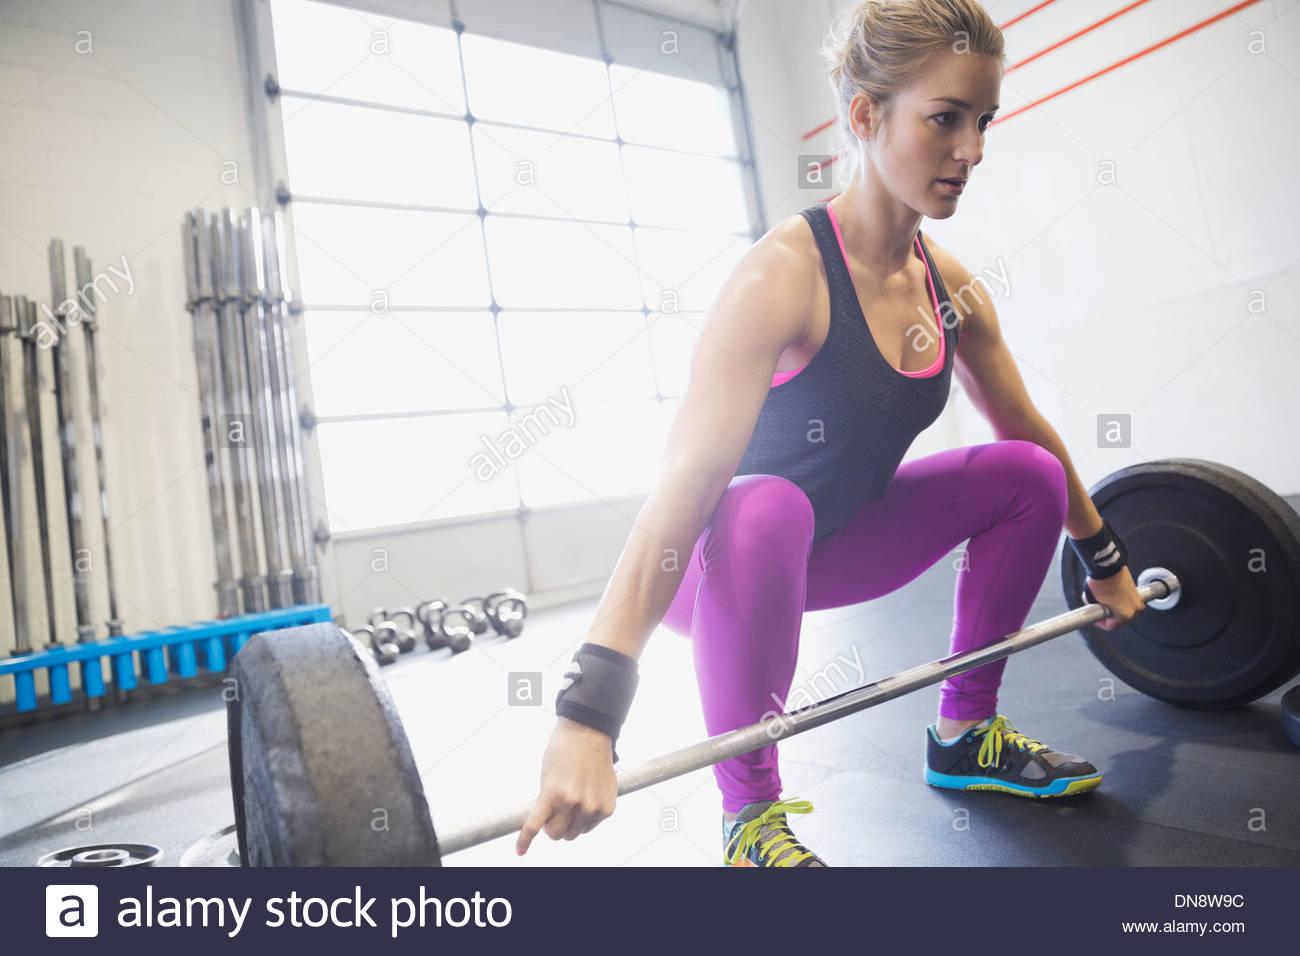 Mulher praticando deadlifts Imagens de Stock